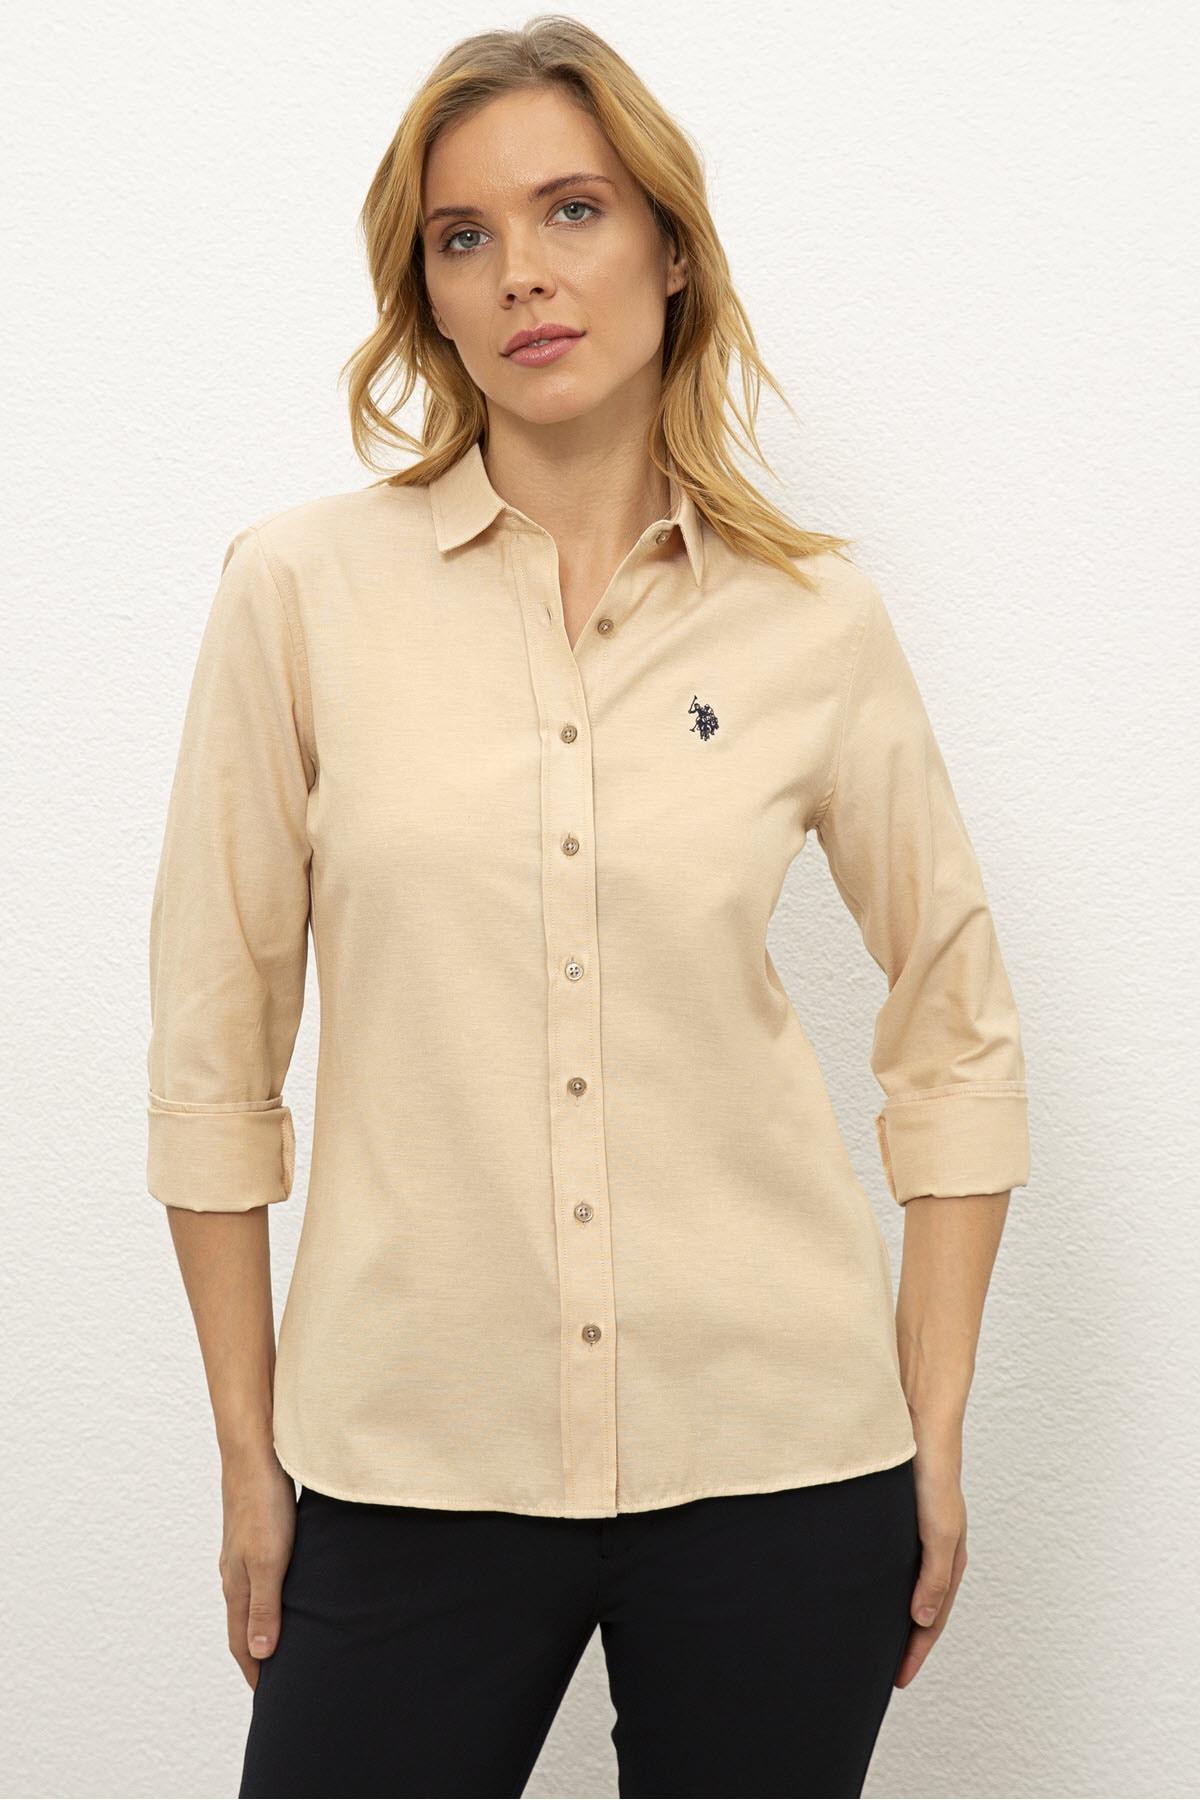 U.S. Polo Assn. Kahverengı Kadın Dokuma Gömlek G082Gl004.000.1261820 1